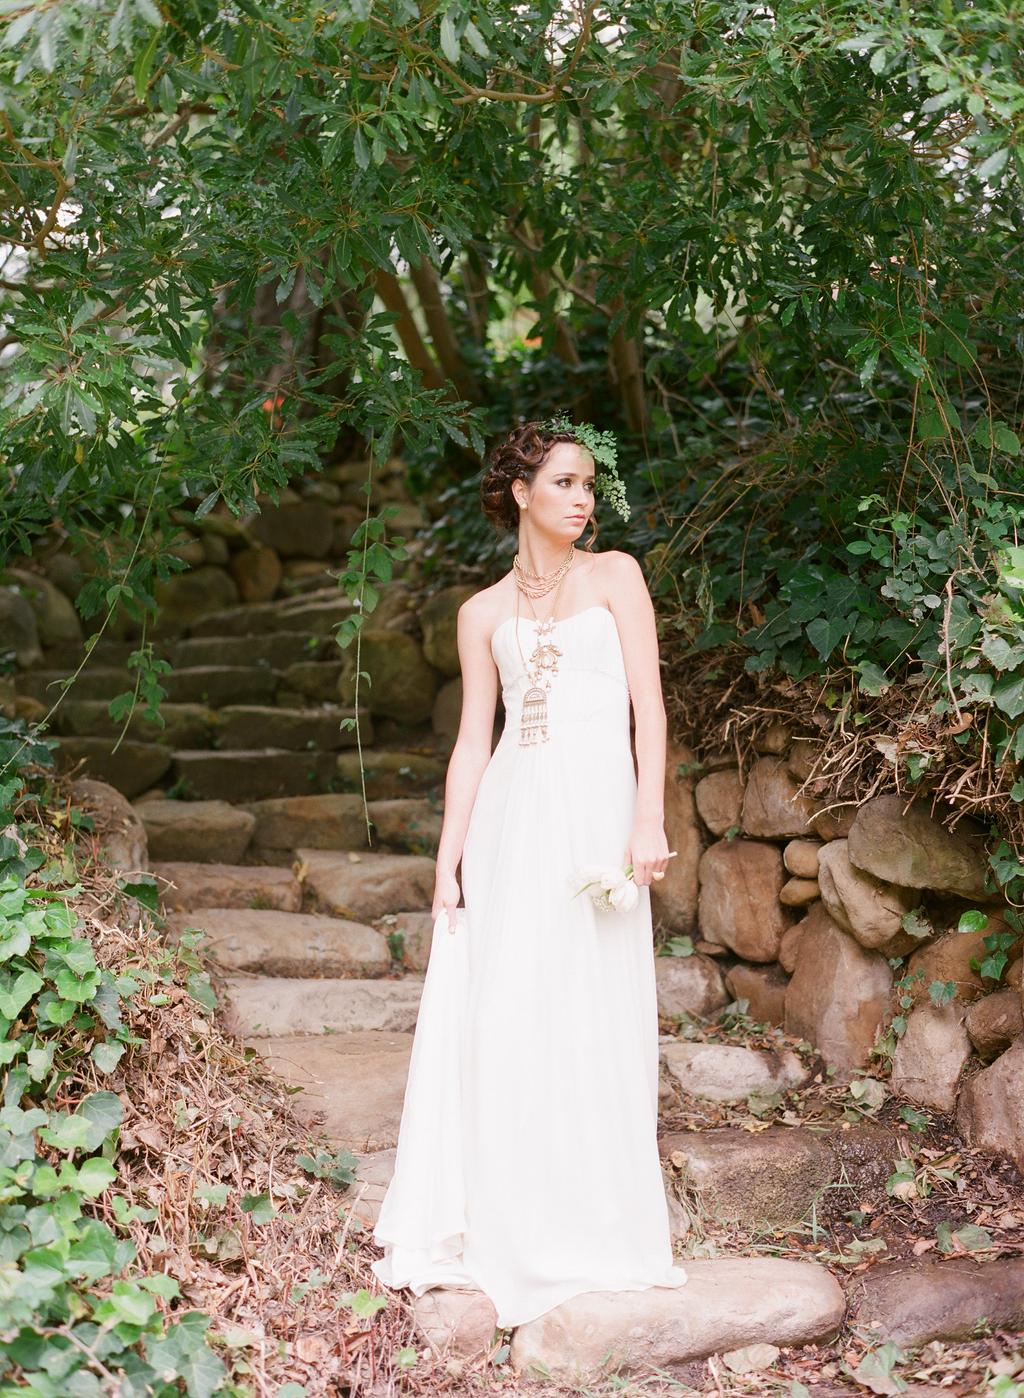 Styled-wedding-santa-barbara-chic-beaux-arts-phtographie-italian-bohemian-wedding-bride-wedding-dress-104.full